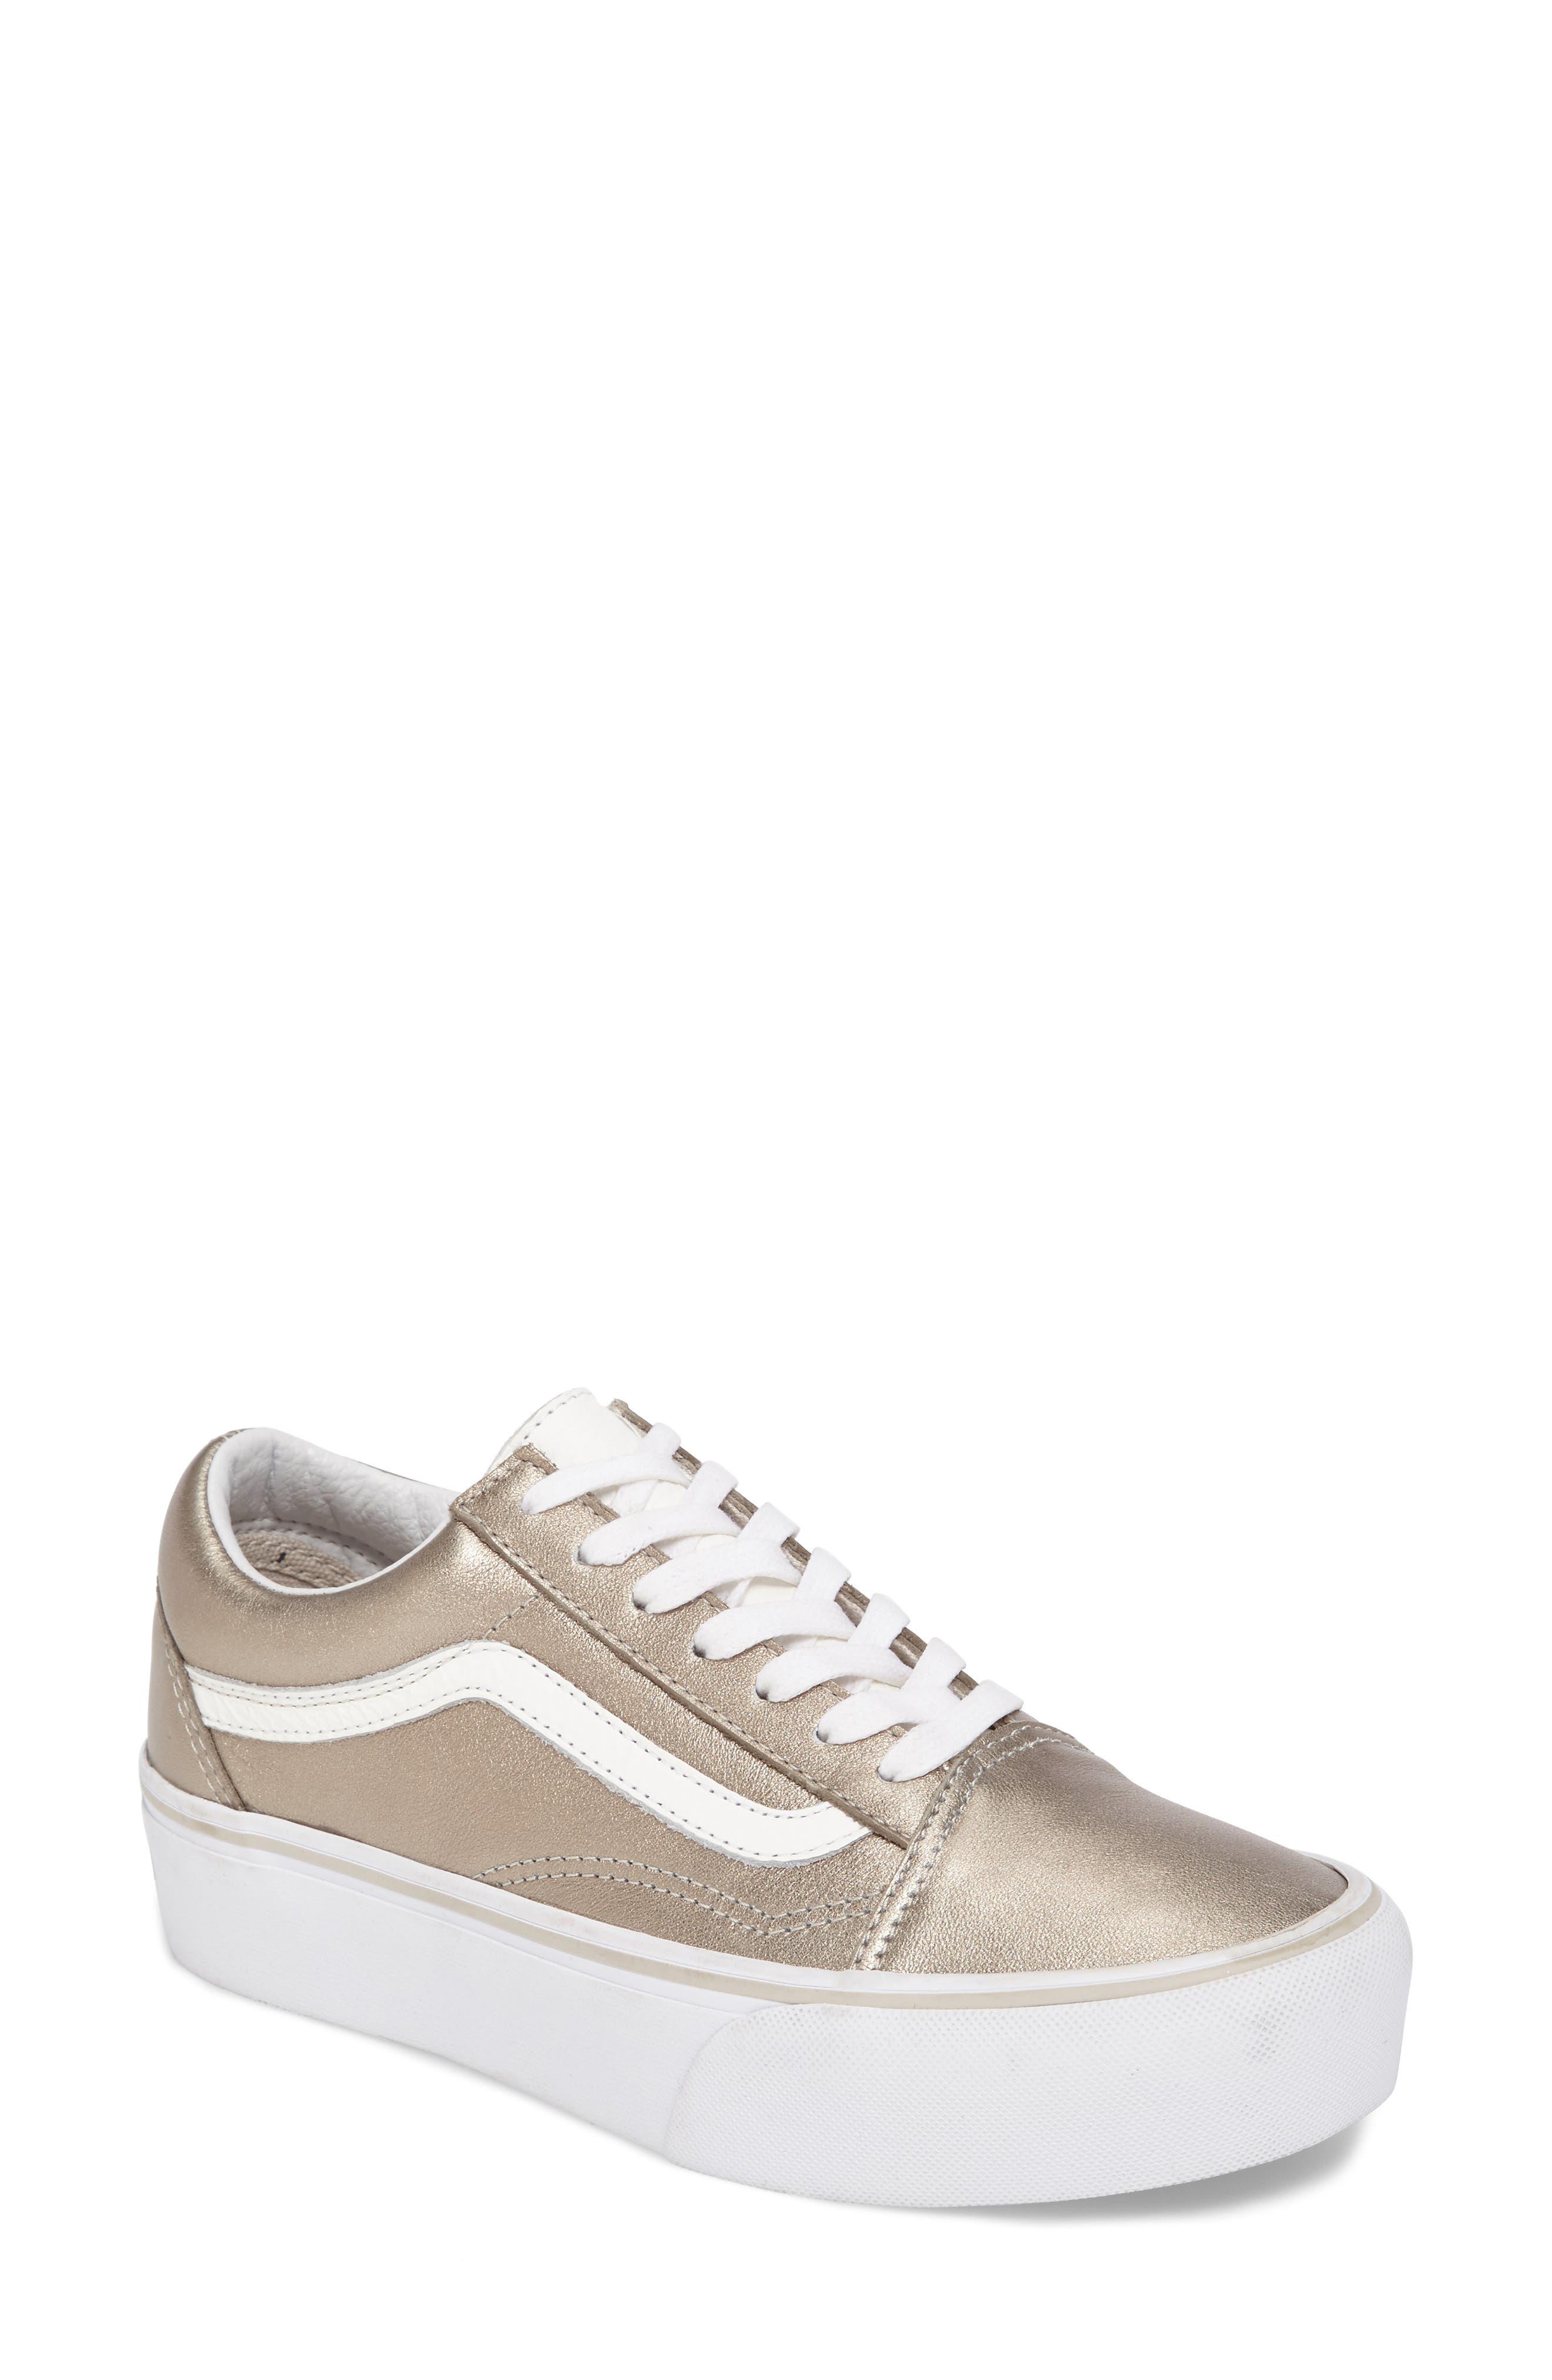 Old Skool Platform Sneaker,                             Main thumbnail 5, color,